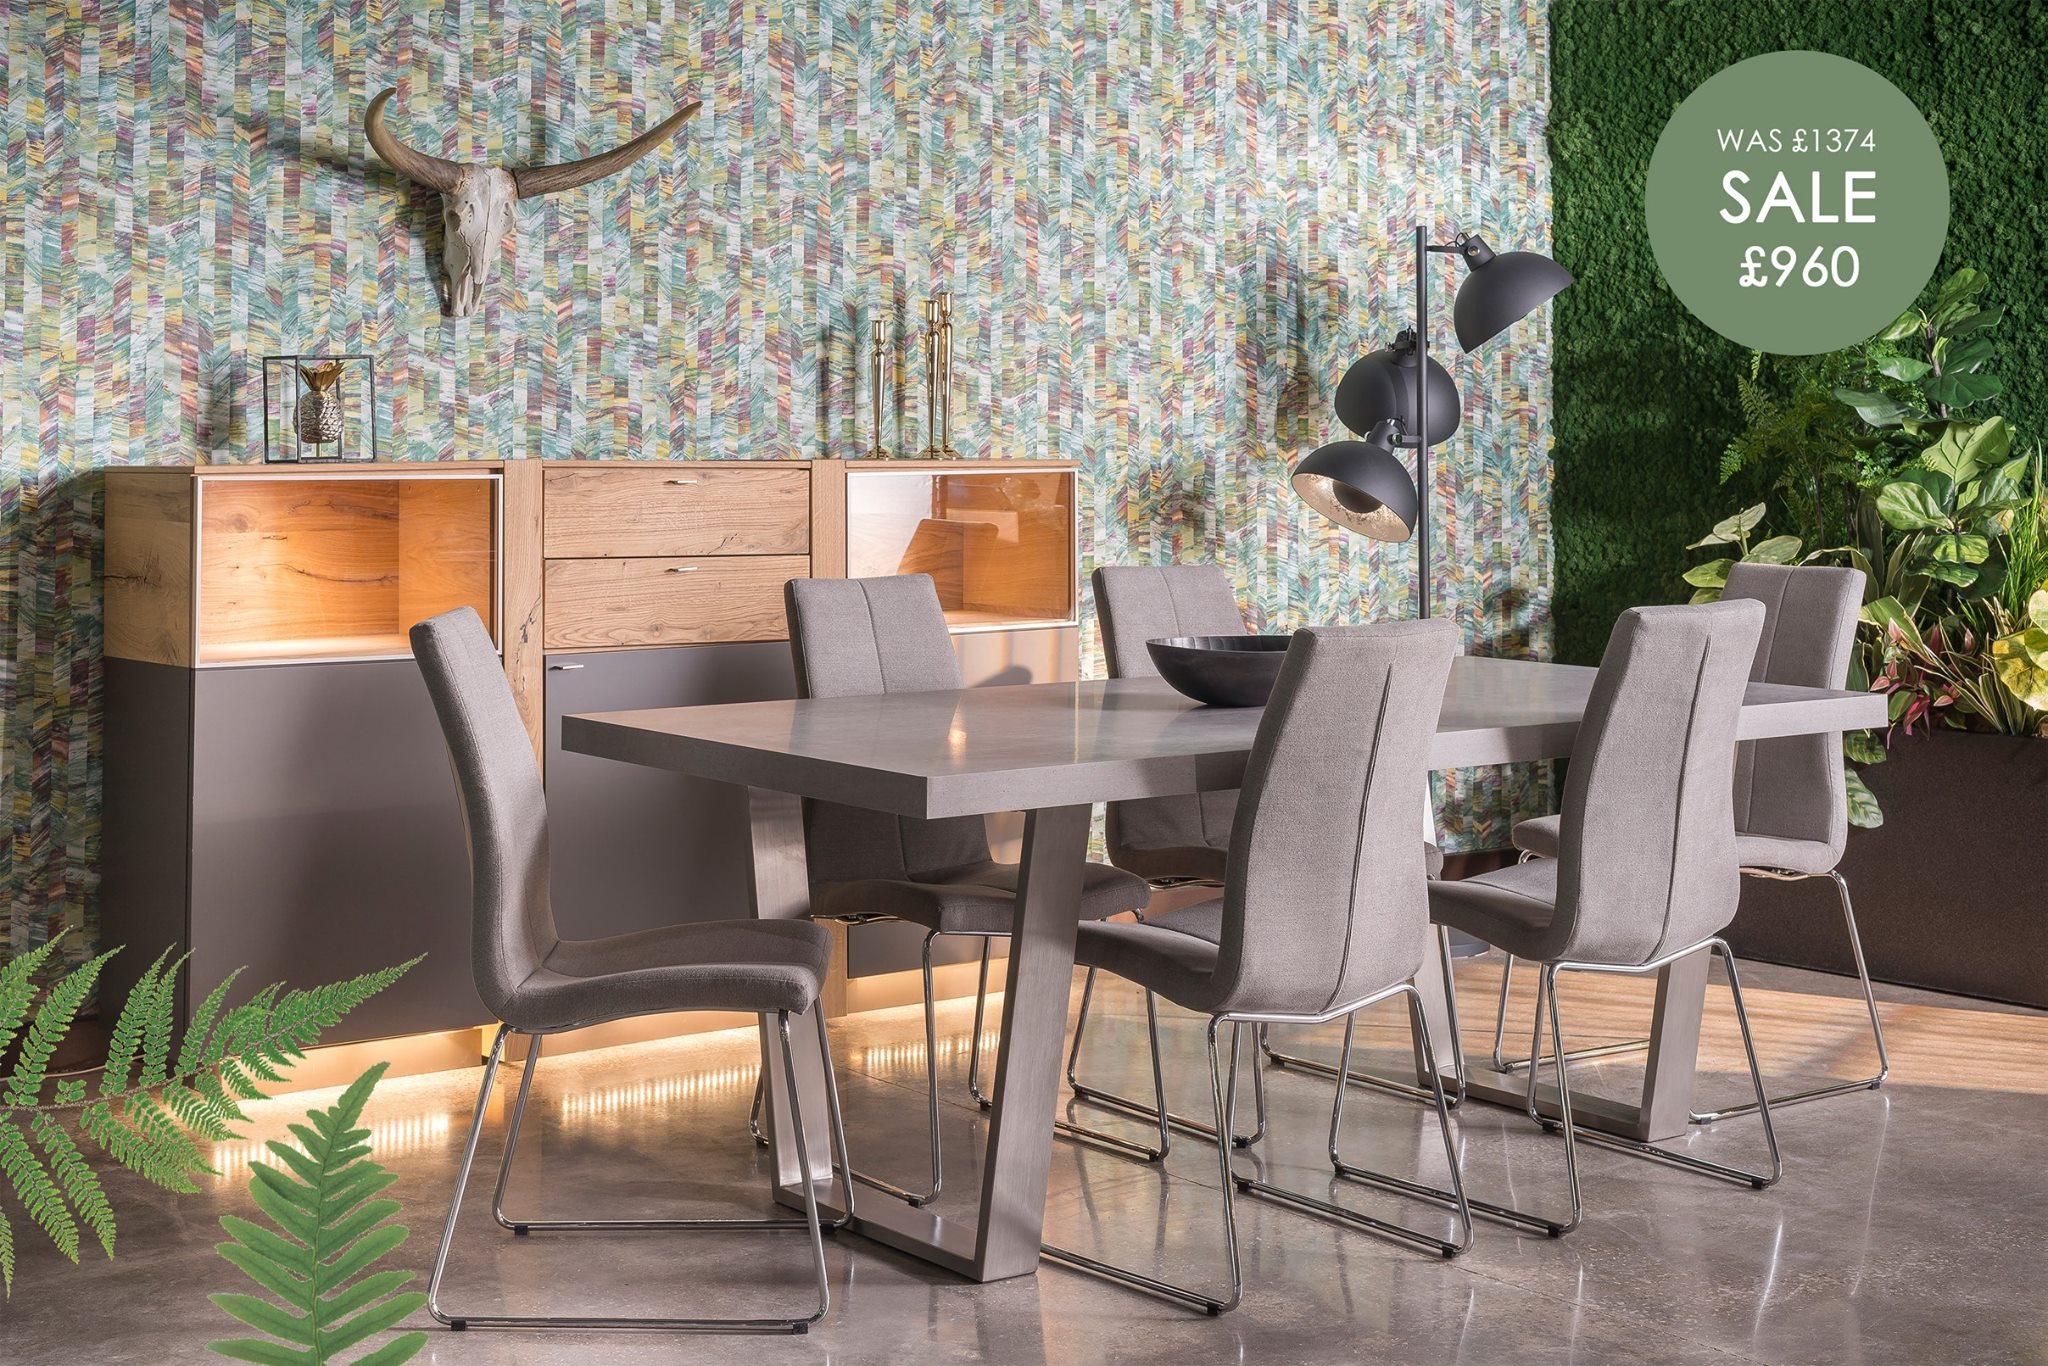 Stollers - Retail Interior Design - North West UK